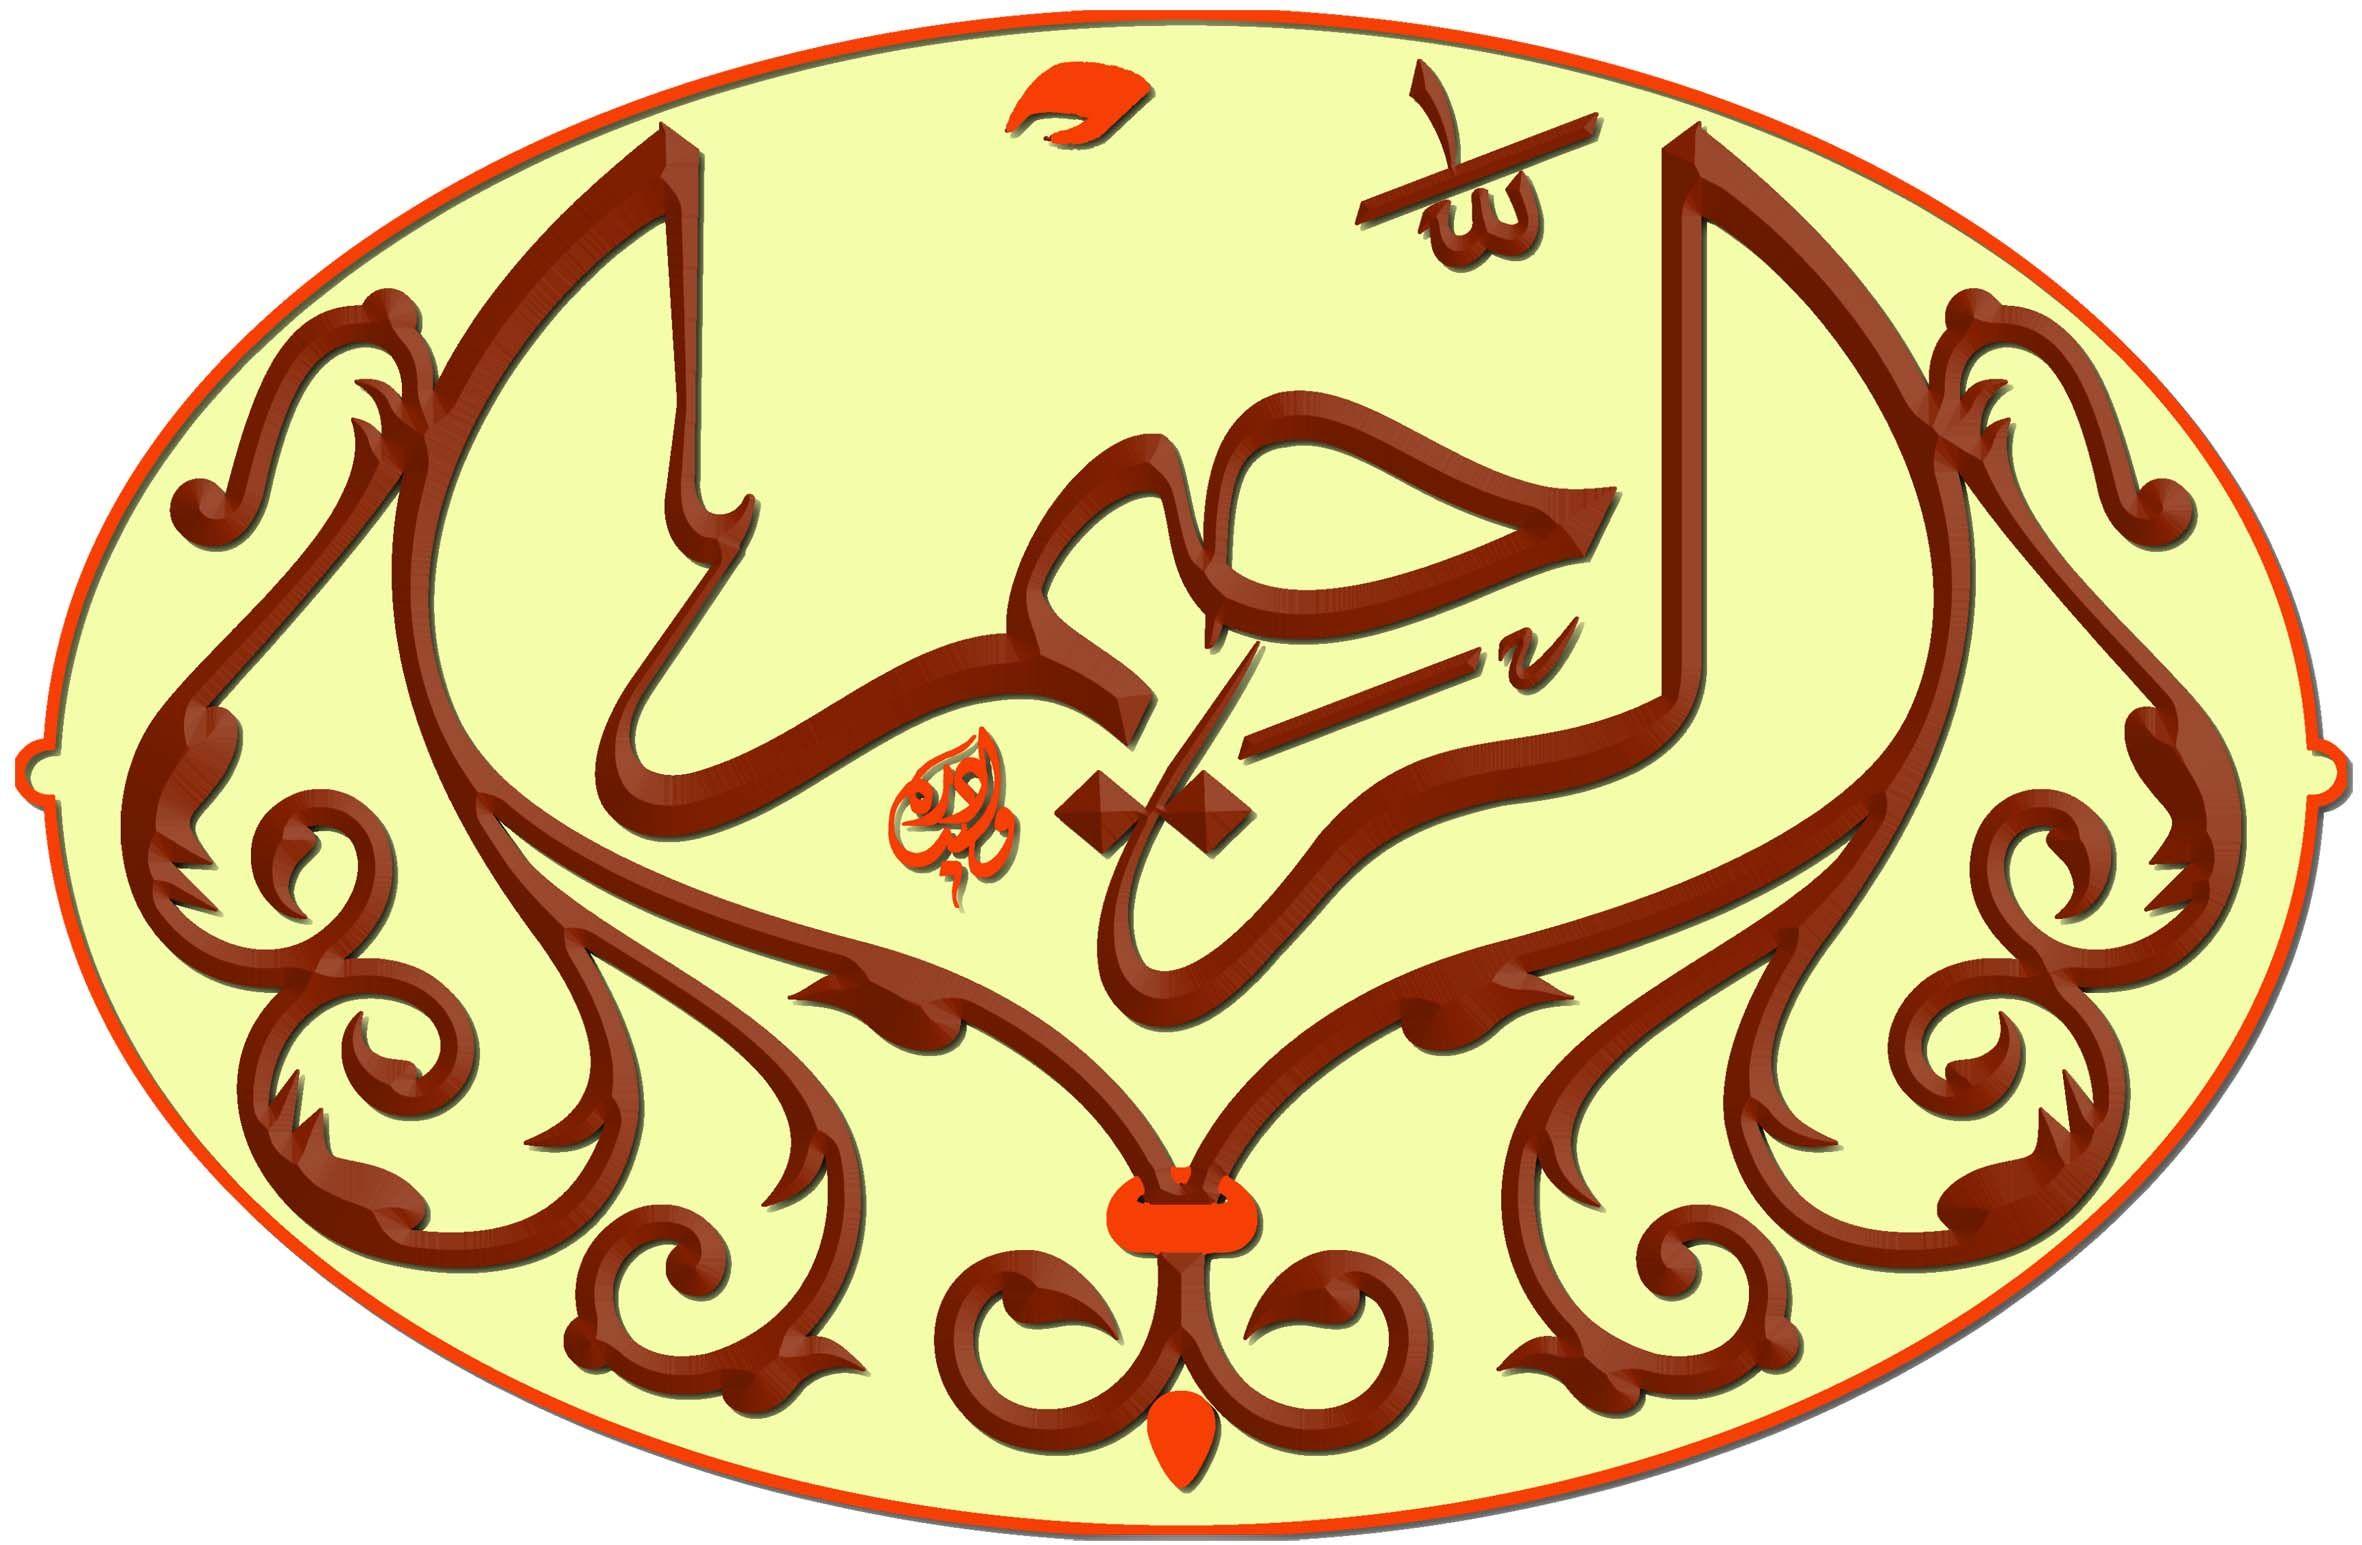 Allah وليد إبراهيم دره اسم الله الرحيم خطوط عربية زخرفة إسلامية Handwriting Calligraphy Handdrawing ثلث خط ع Calligraphy Design Arabic Calligraphy